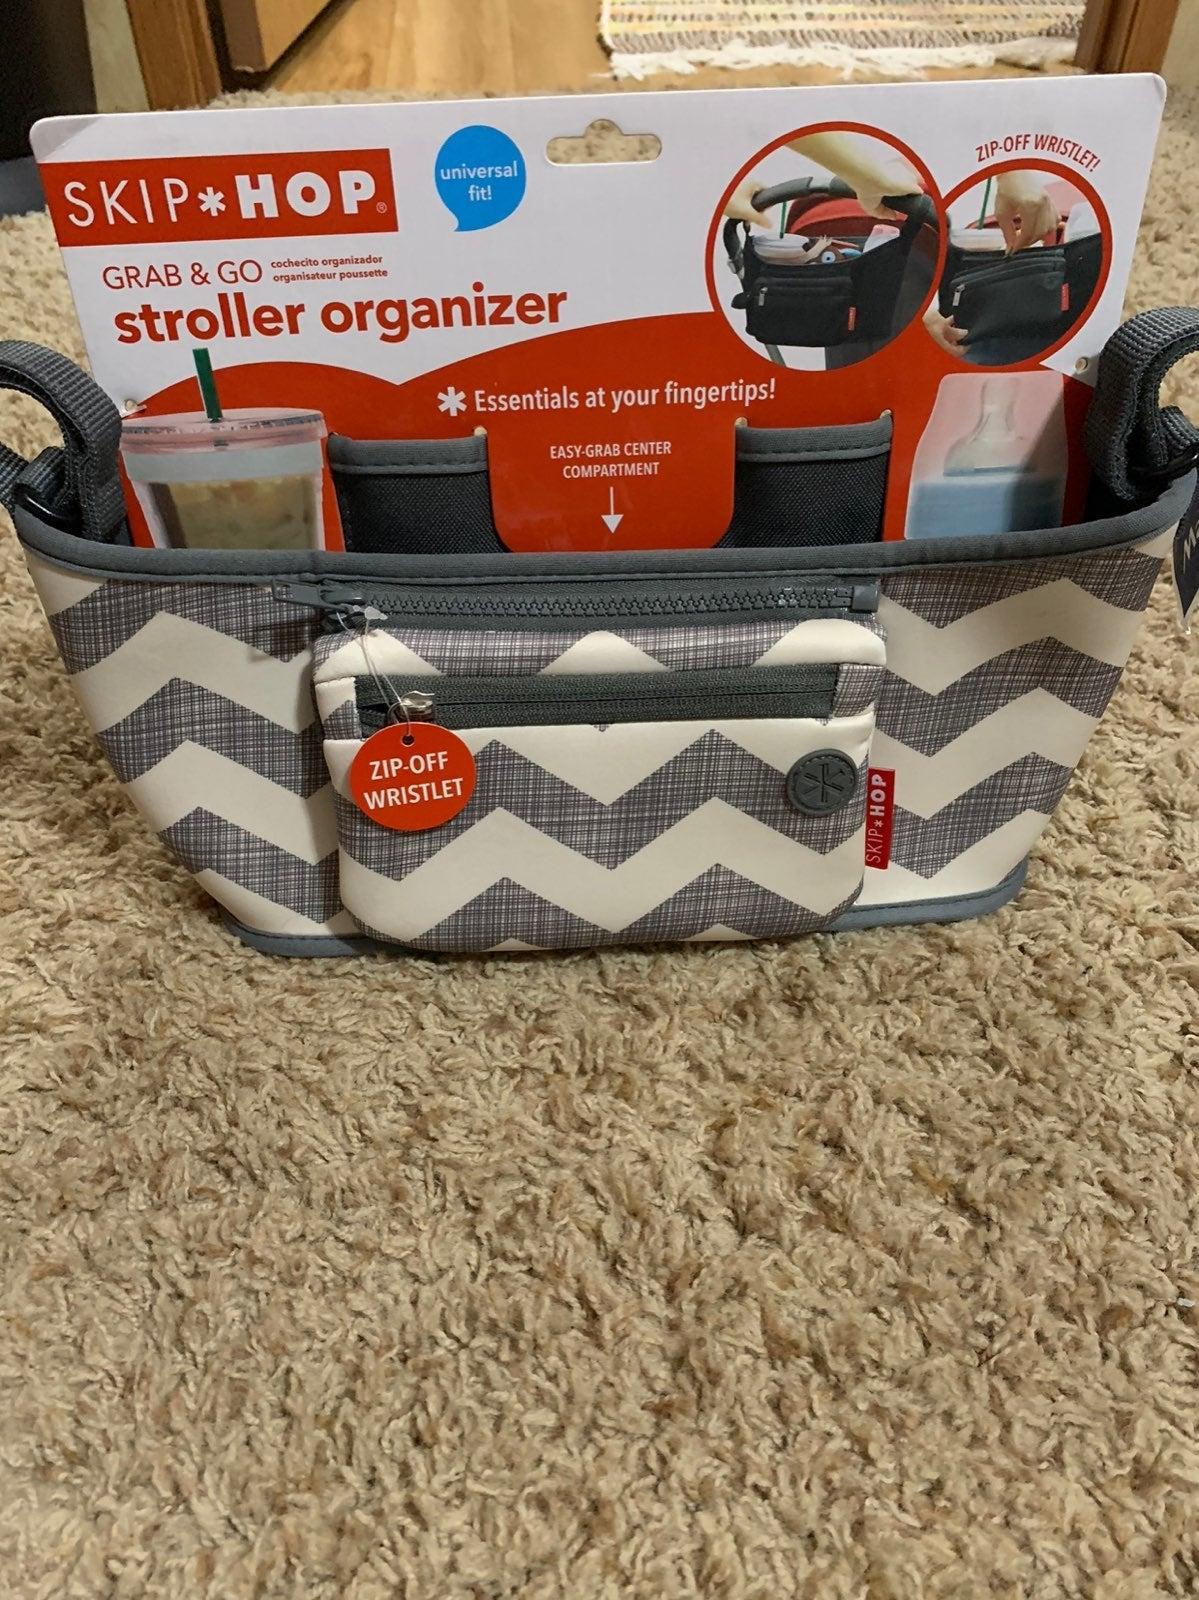 Grab and Go stroller organizer